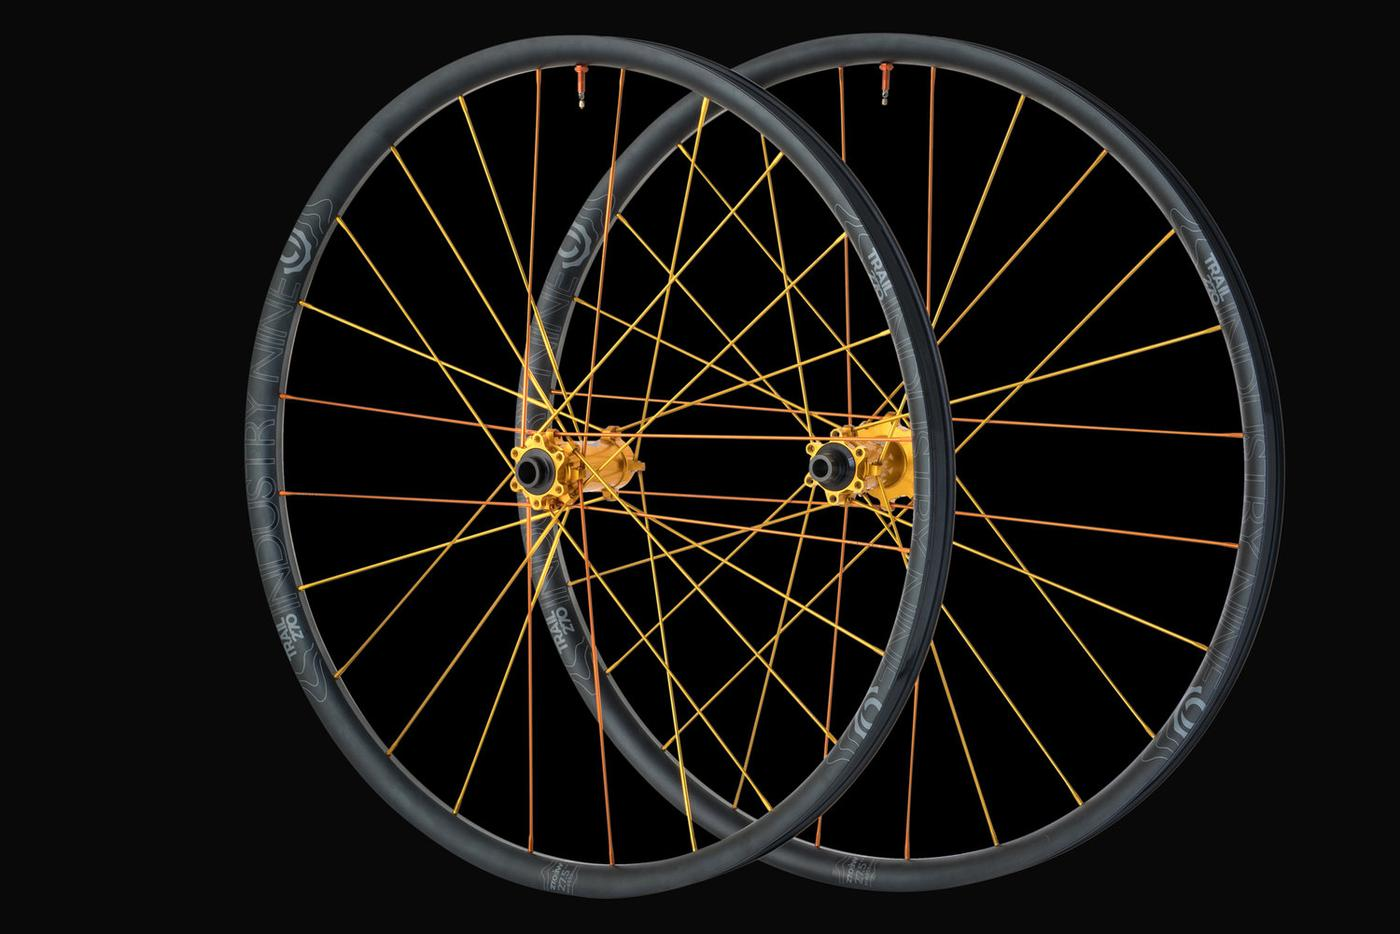 Industry Nine Debuts their TRAIL 270 24 HOLE 27.5″ MTB Wheels